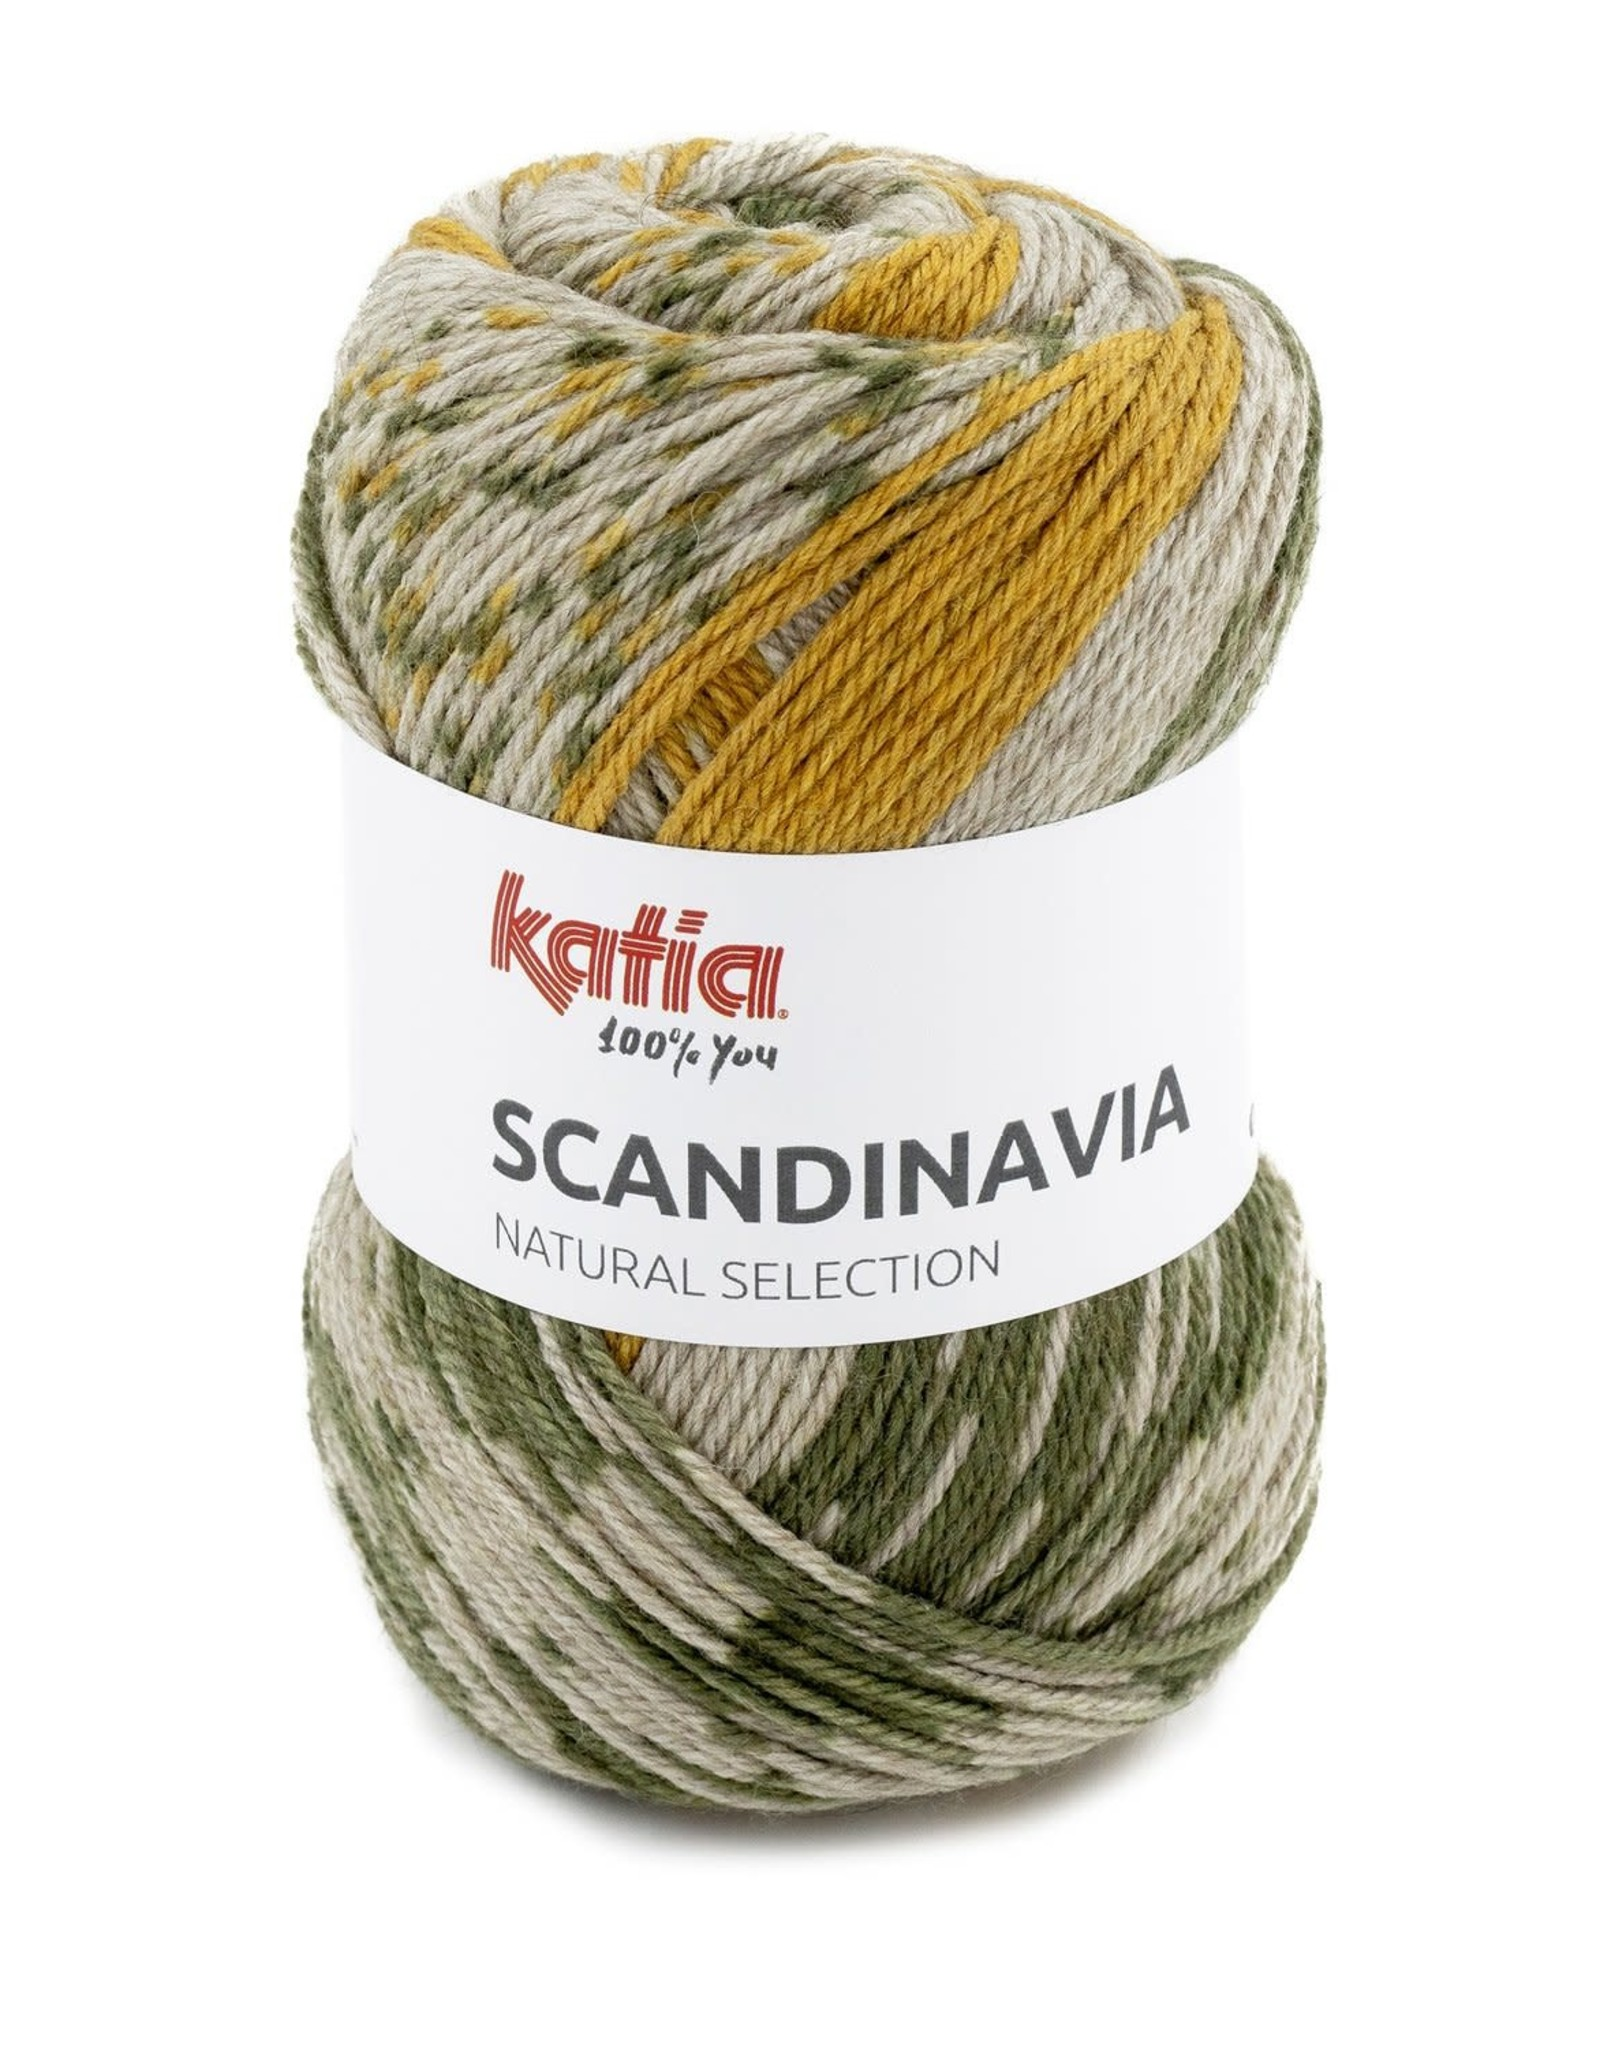 Katia Katia scandinavia 206 - Groen-Geel